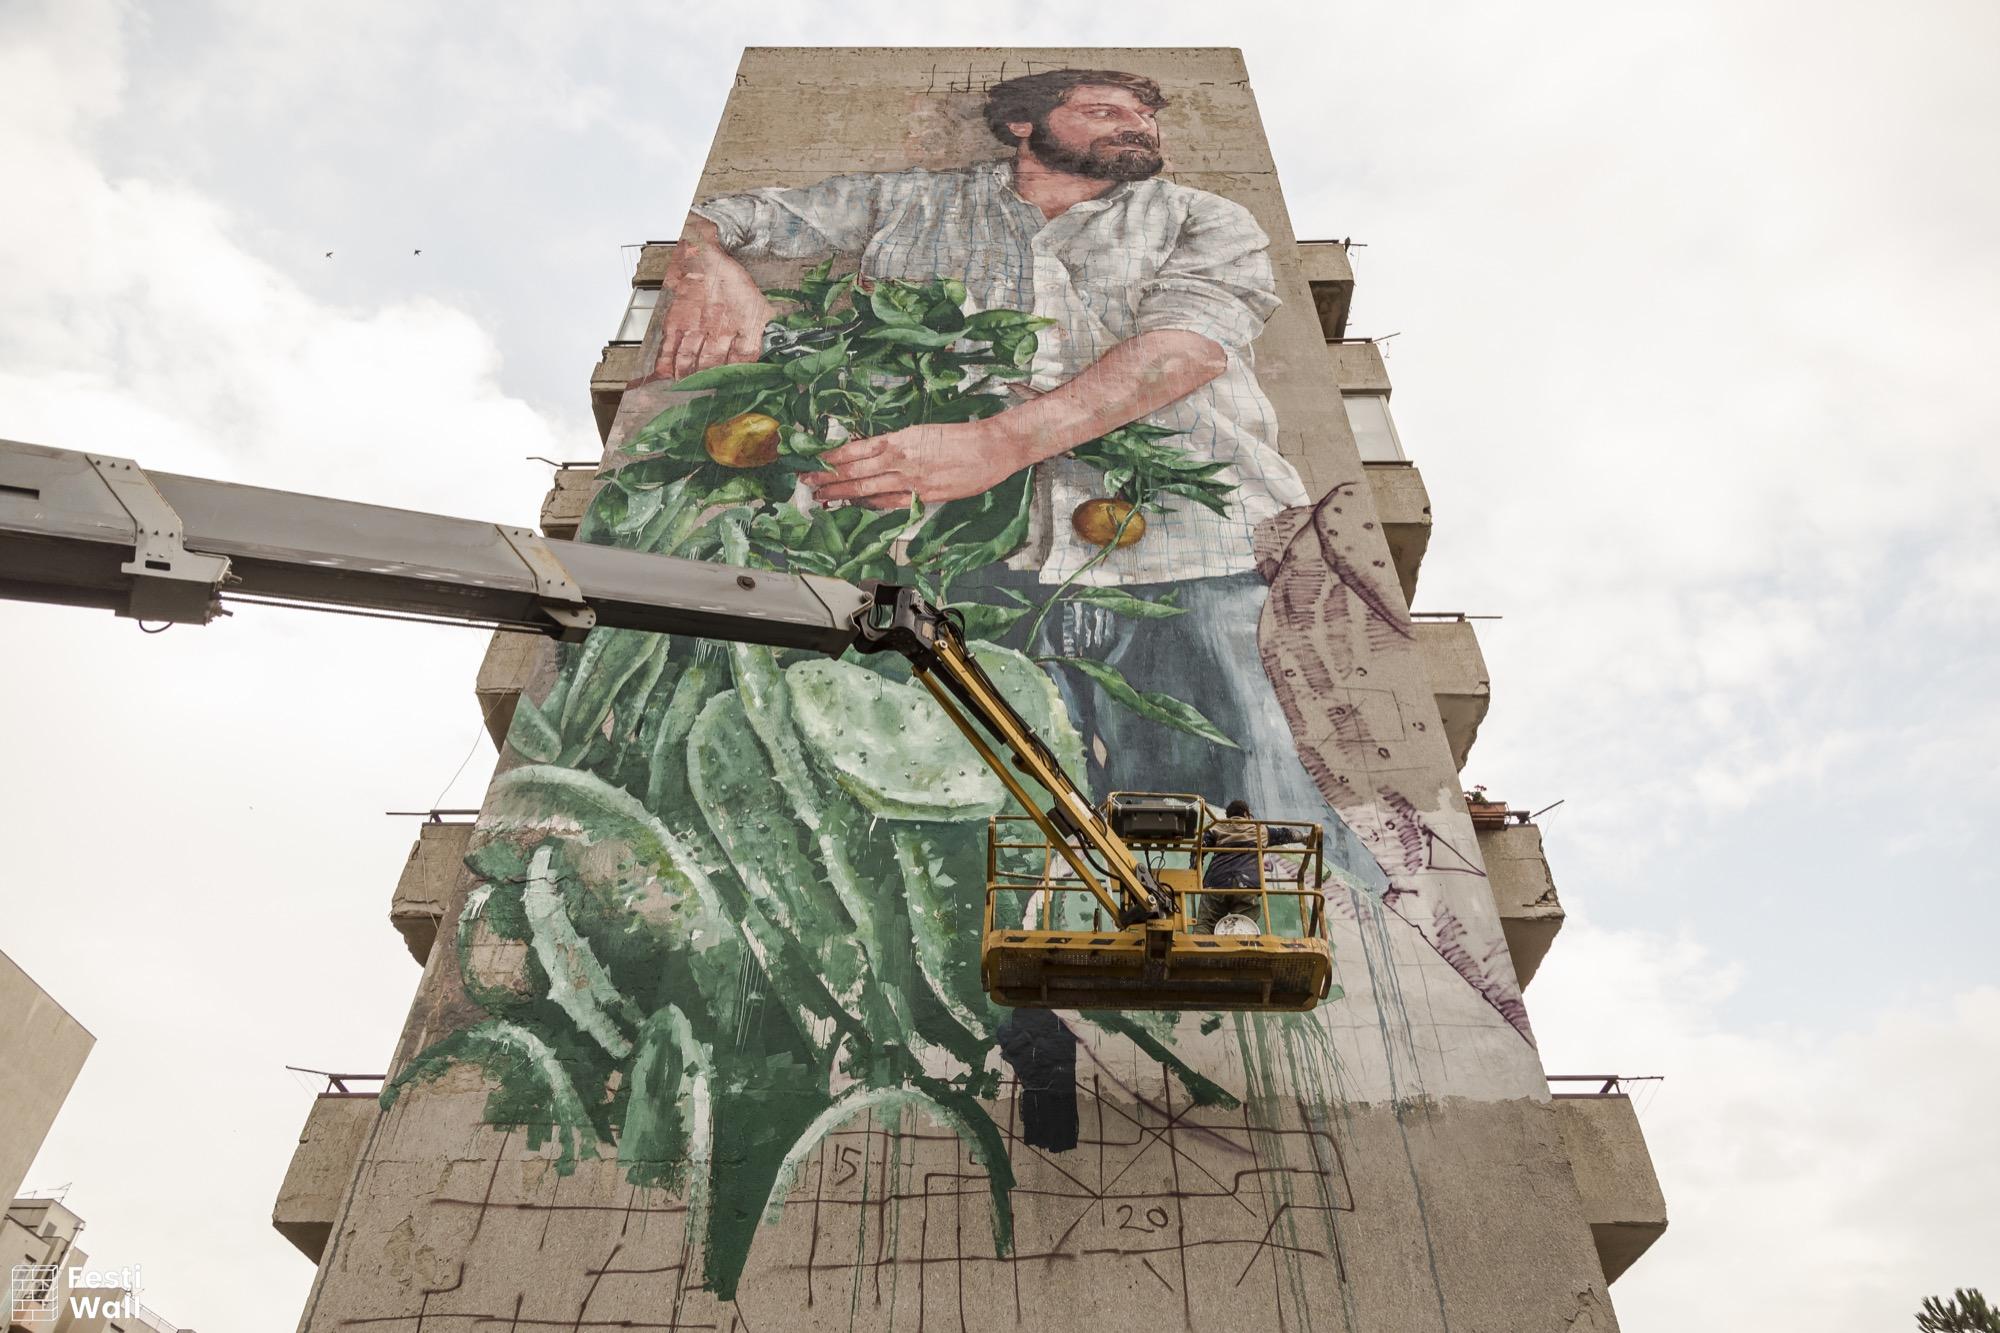 Fintan Magee_The Gardener_ragusa_festiwall_10